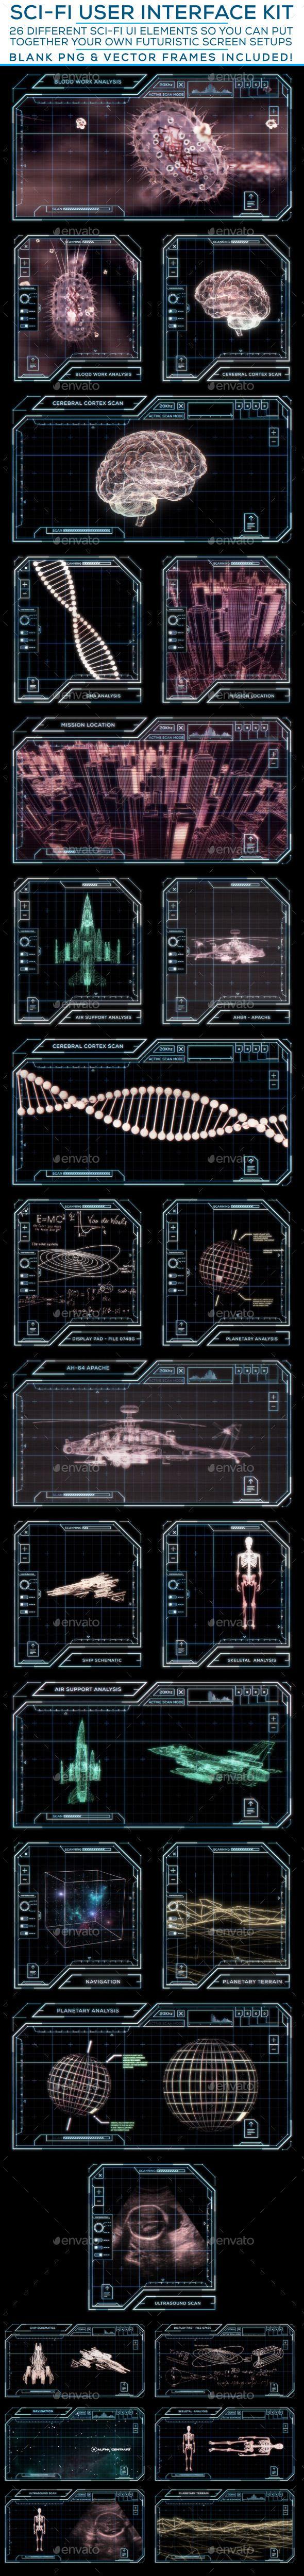 Sci-Fi User Interface Kit Template PSD #design #ui Download: http://graphicriver.net/item/scifi-user-interface-kit/12408671?ref=ksioks